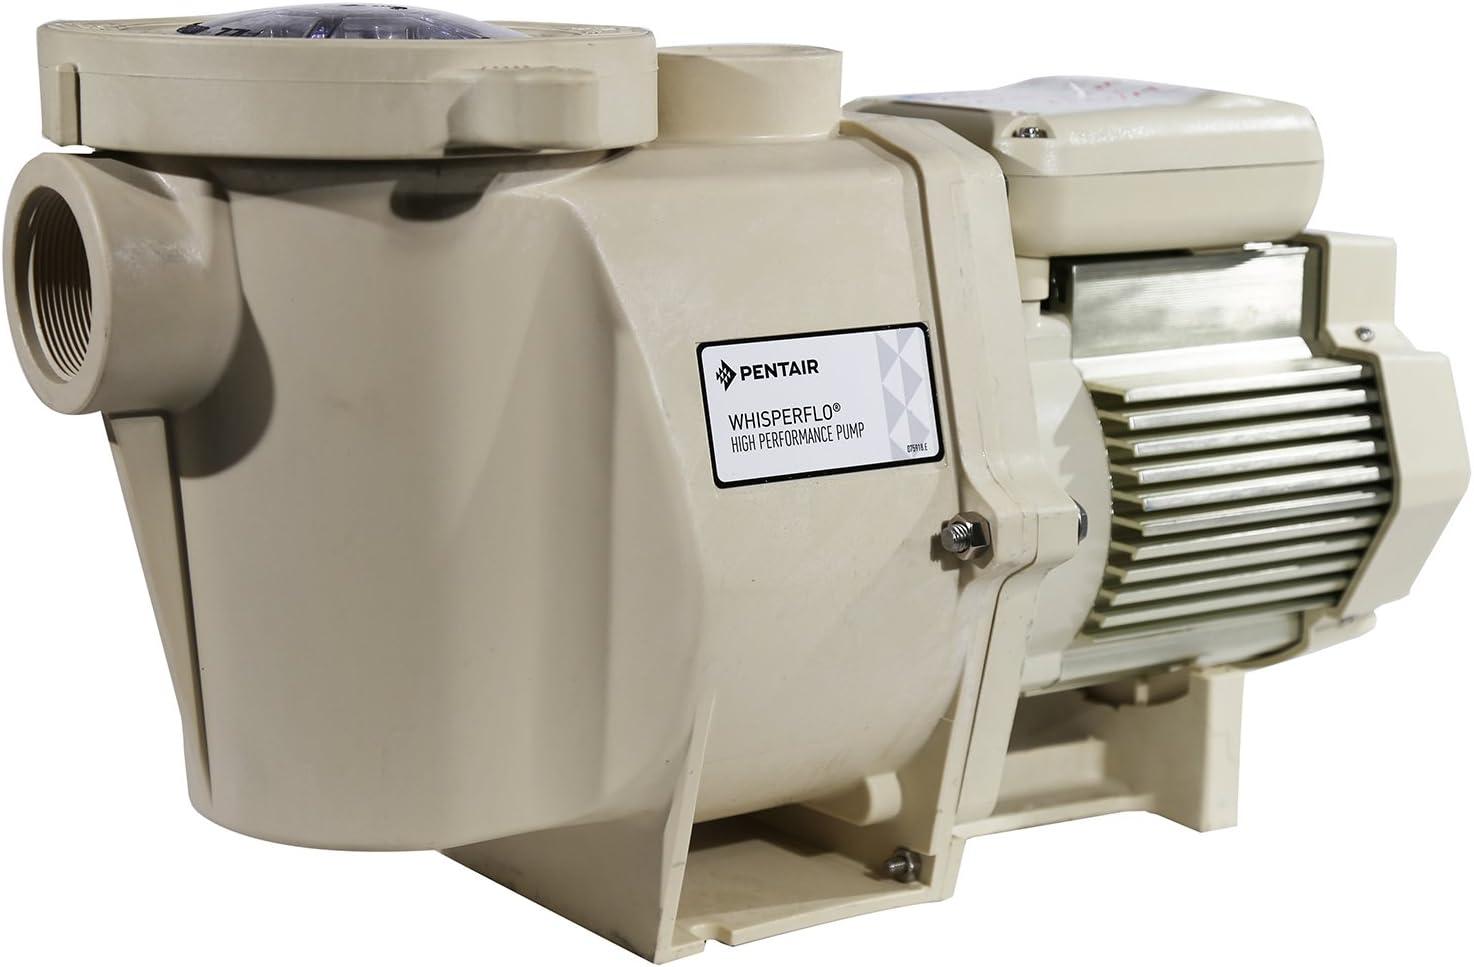 Pentair 011642 WhisperFlo High Performance TEFC Super-Duty Pool Pump, 1-1/2 Horsepower, 208-230/460V, 3 Phase